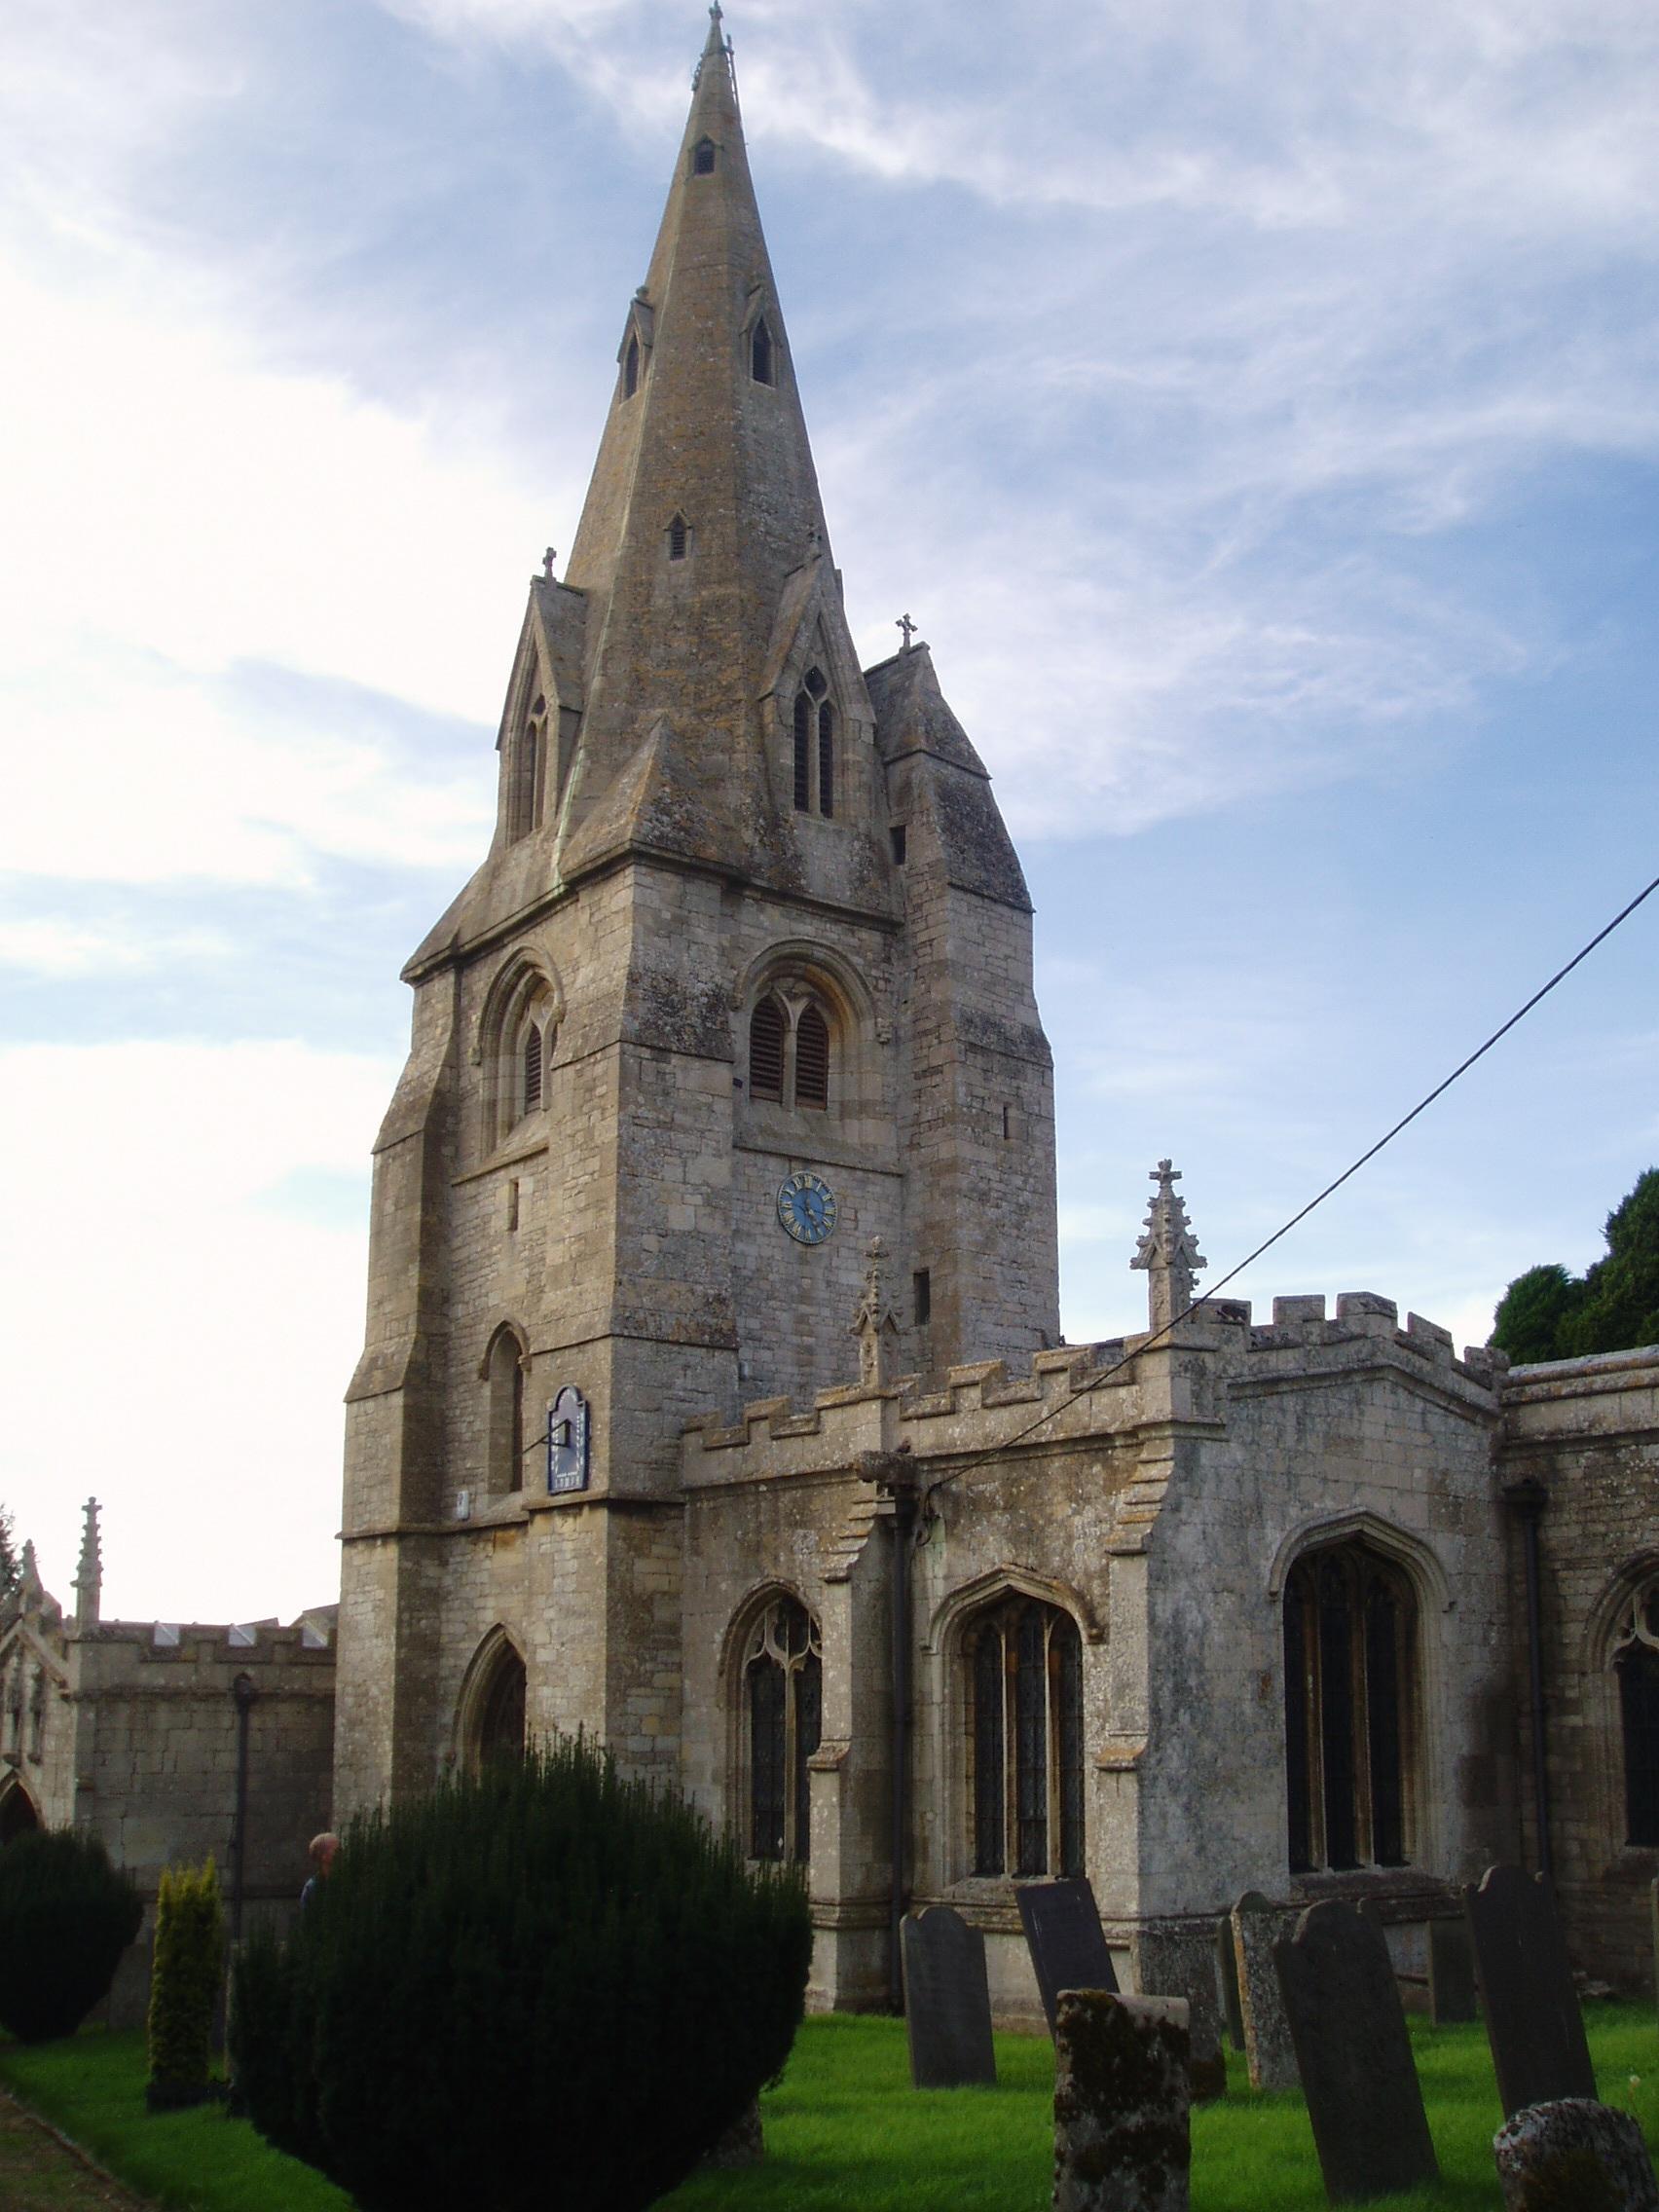 Buckminster, St John the Baptist (c) Aidan McRae Thomson